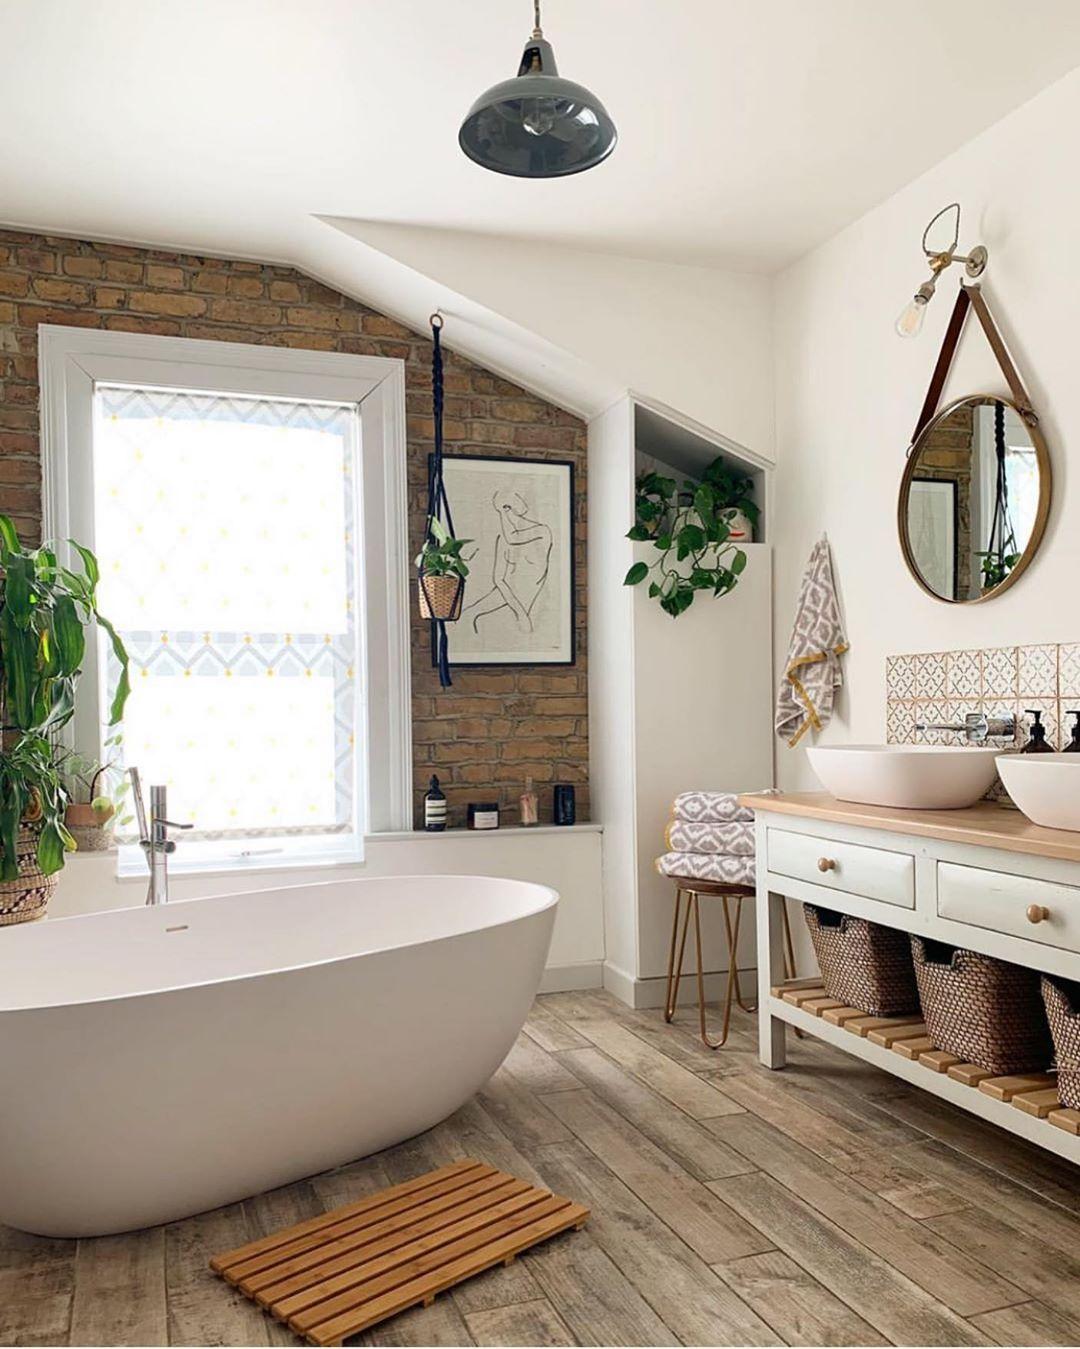 "Photo of Mid Century•Boho•Farmhouse on Instagram: ""Hello dream bathroom 😍 this is absolutely stunning! 👌🏼 (via @this_e17_life) ____________________ . . . . . . . . . . . #homeinspo…"""